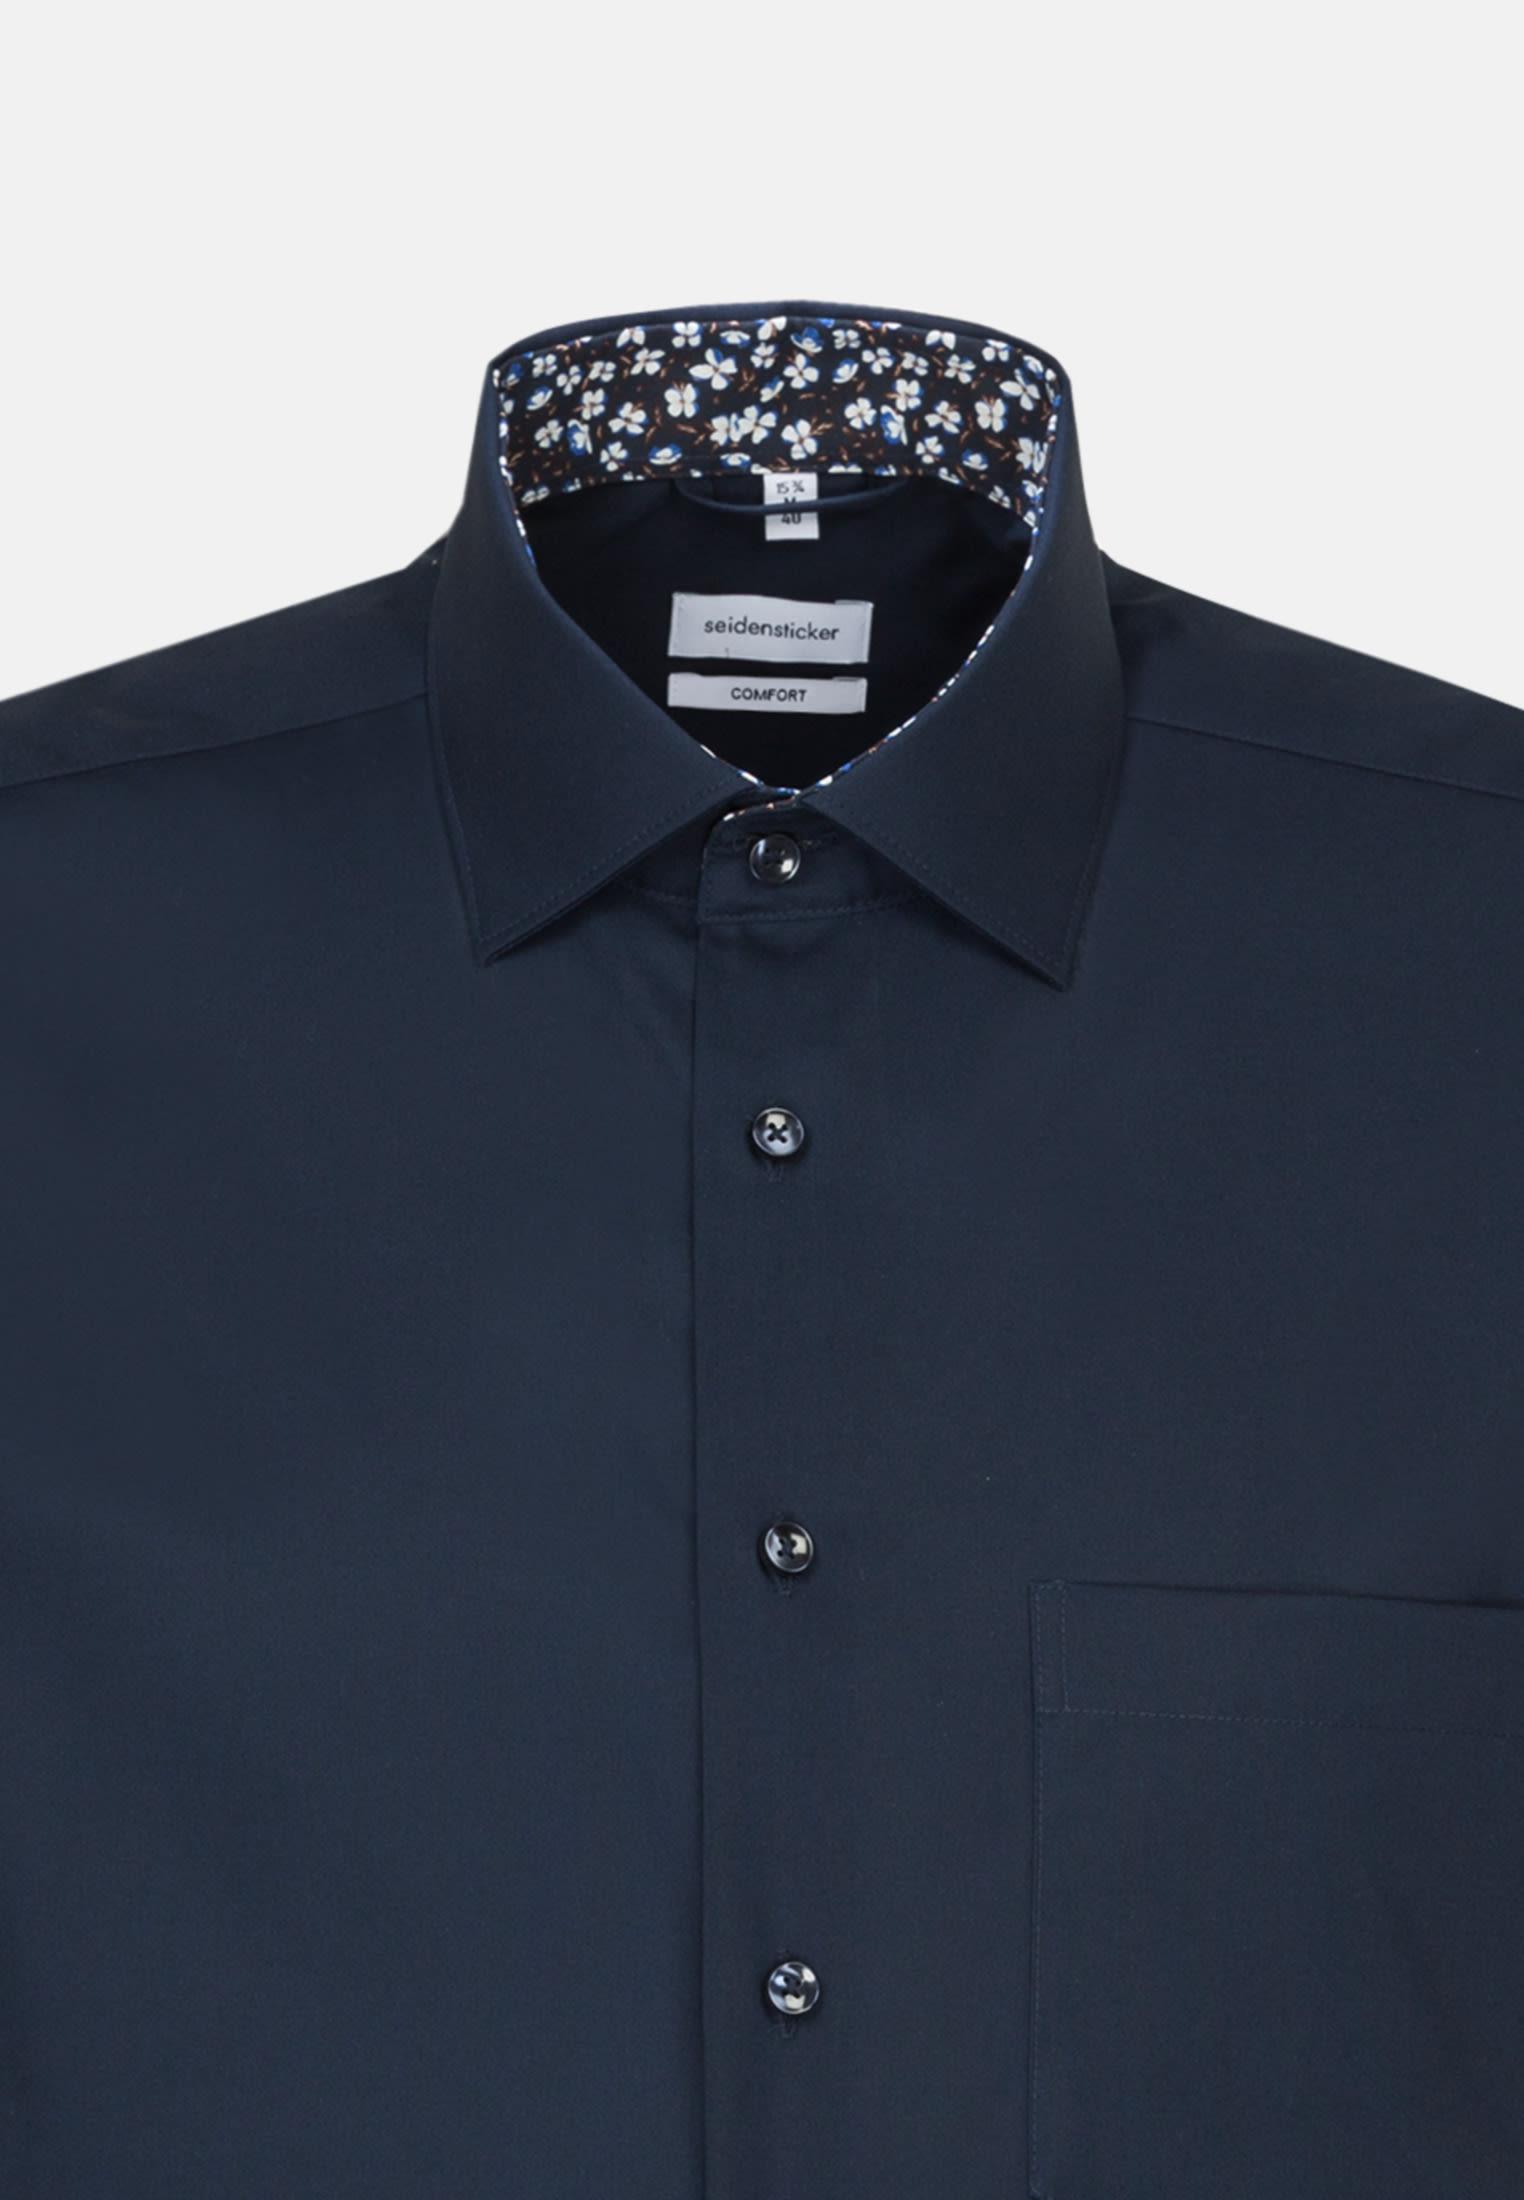 Bügelfreies Popeline Kurzarm Business Hemd in Comfort mit Kentkragen in Dunkelblau |  Seidensticker Onlineshop